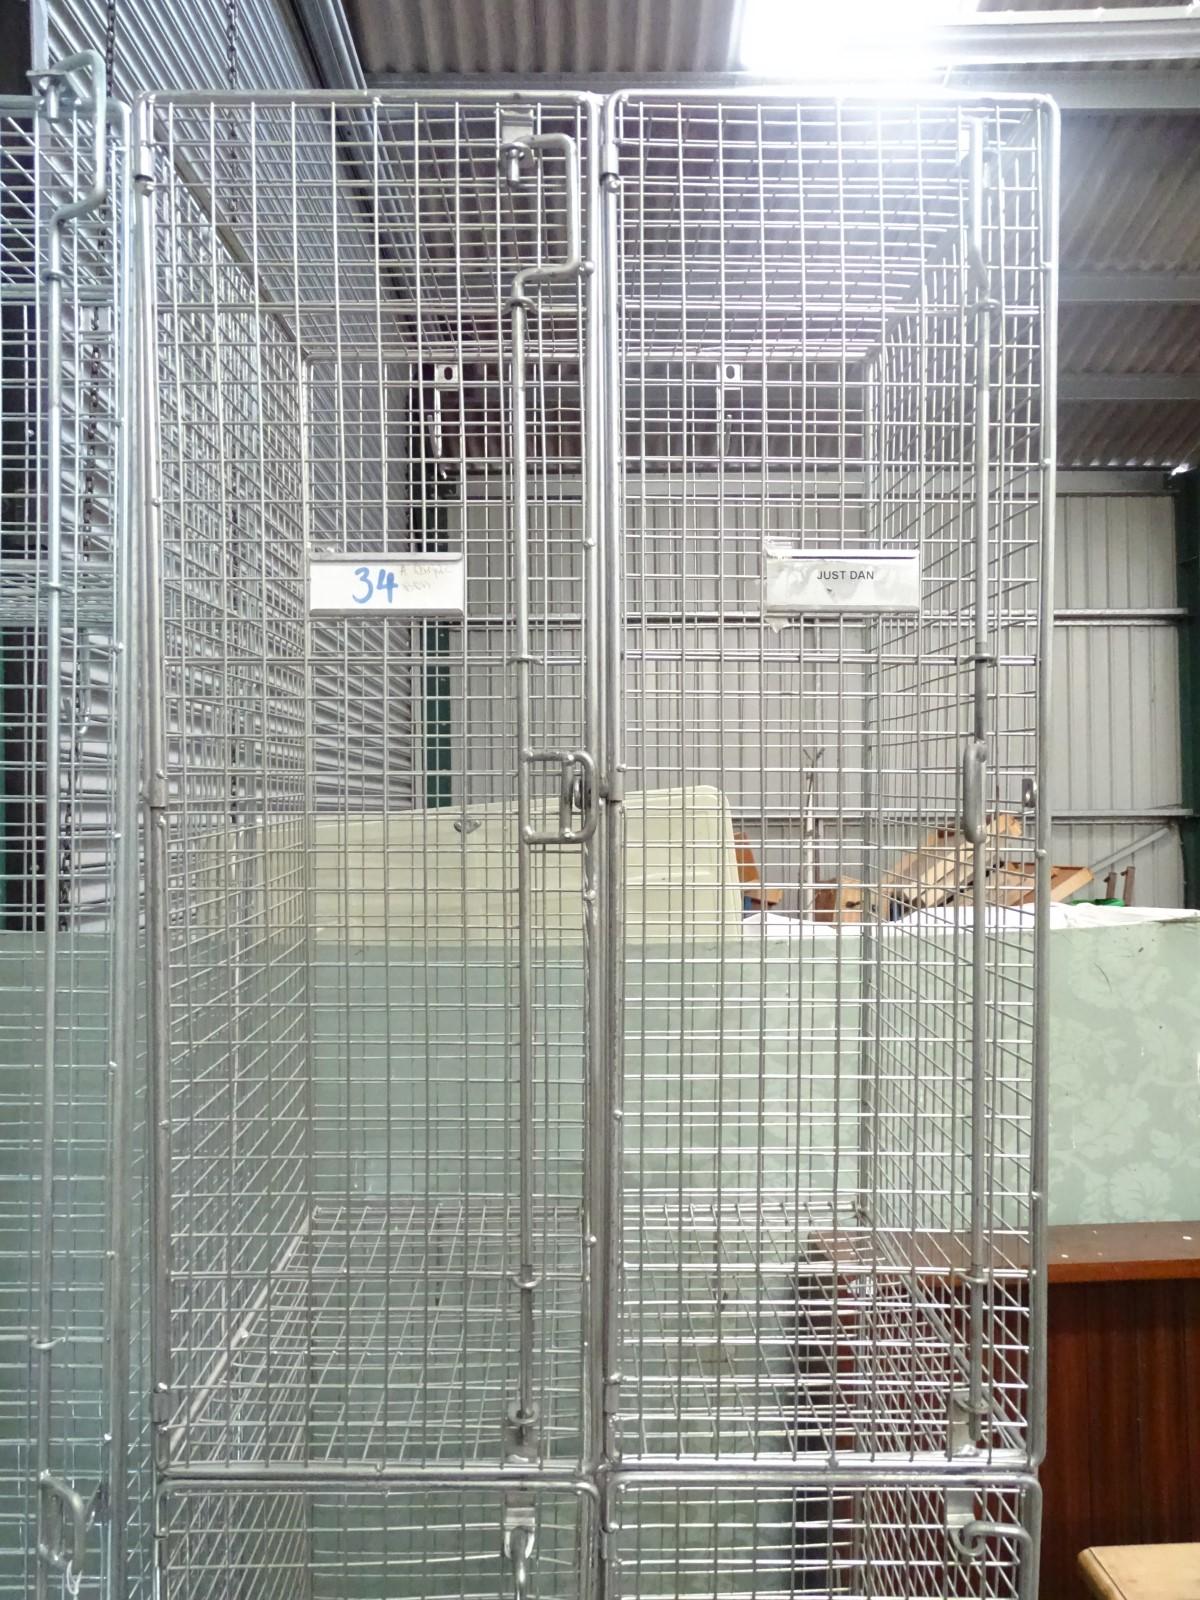 Lot 2 - An old school weld mesh locker (4 doors) CONDITION: Please Note - we do not make